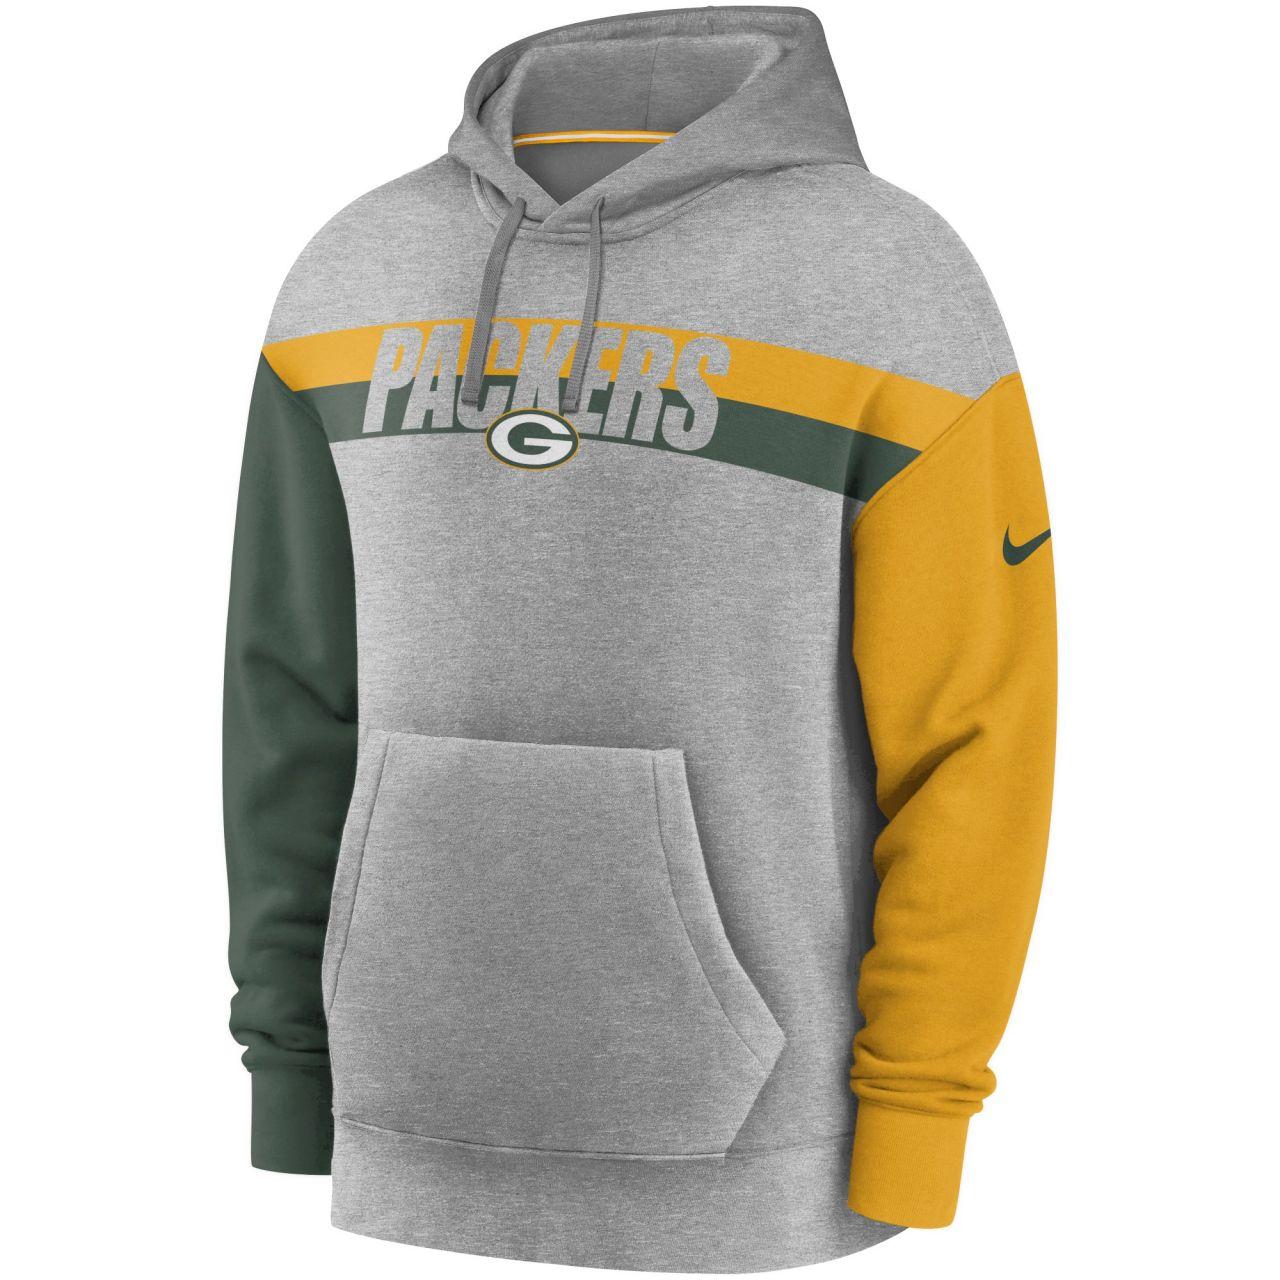 amfoo - Nike NFL Heritage Tri-Blend Hoody - Green Bay Packers